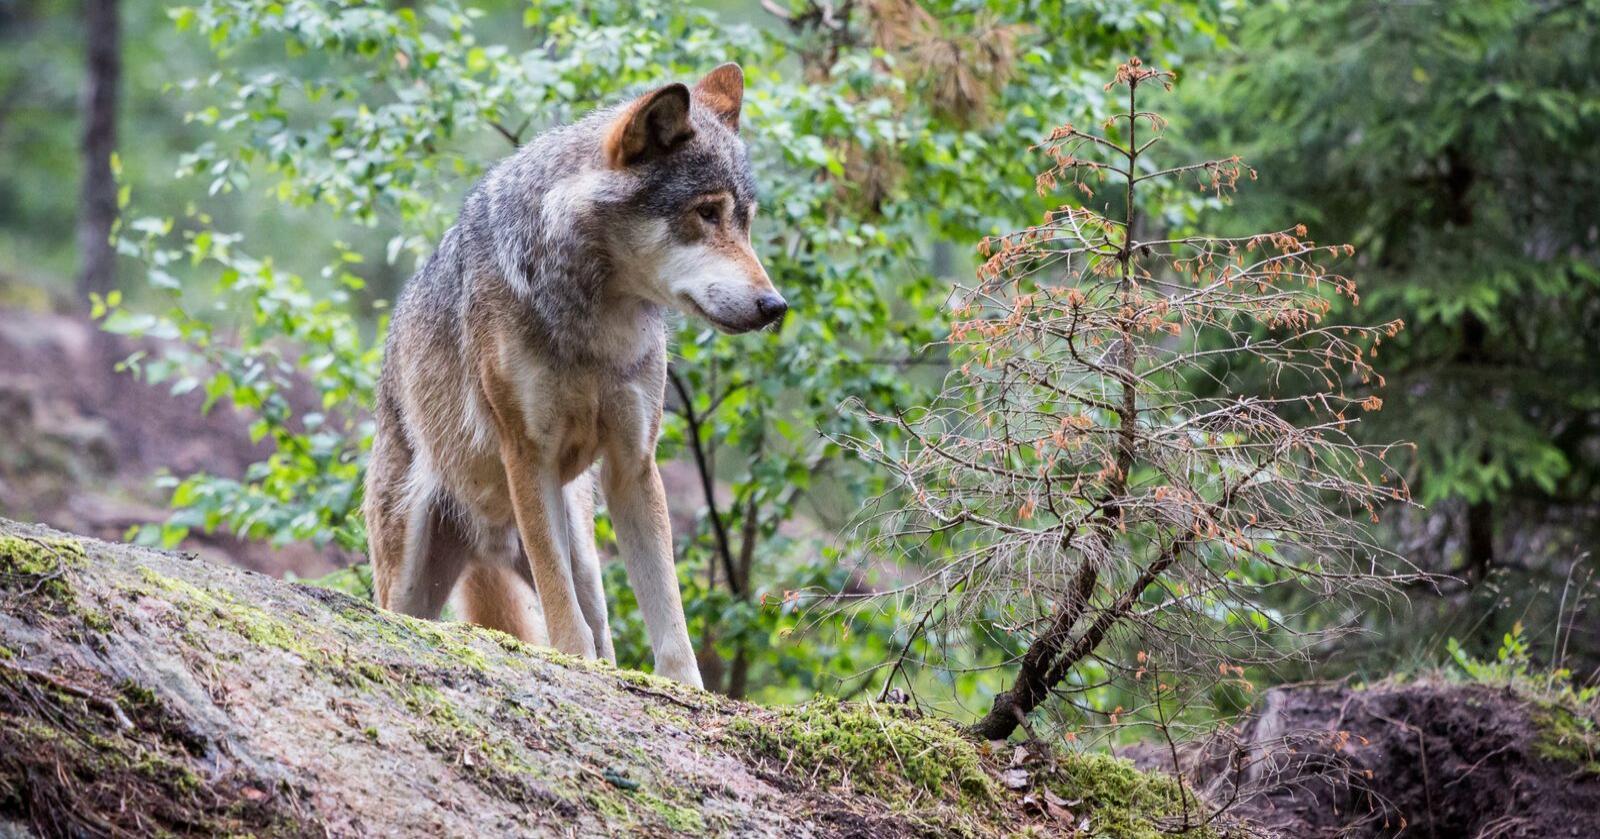 Småbrukarlaget får utdelt DNA-prøver fra 18 ulver. Det skal nå sjekkes på det tyske laboratoriet ForGen. Foto: Mostphotos